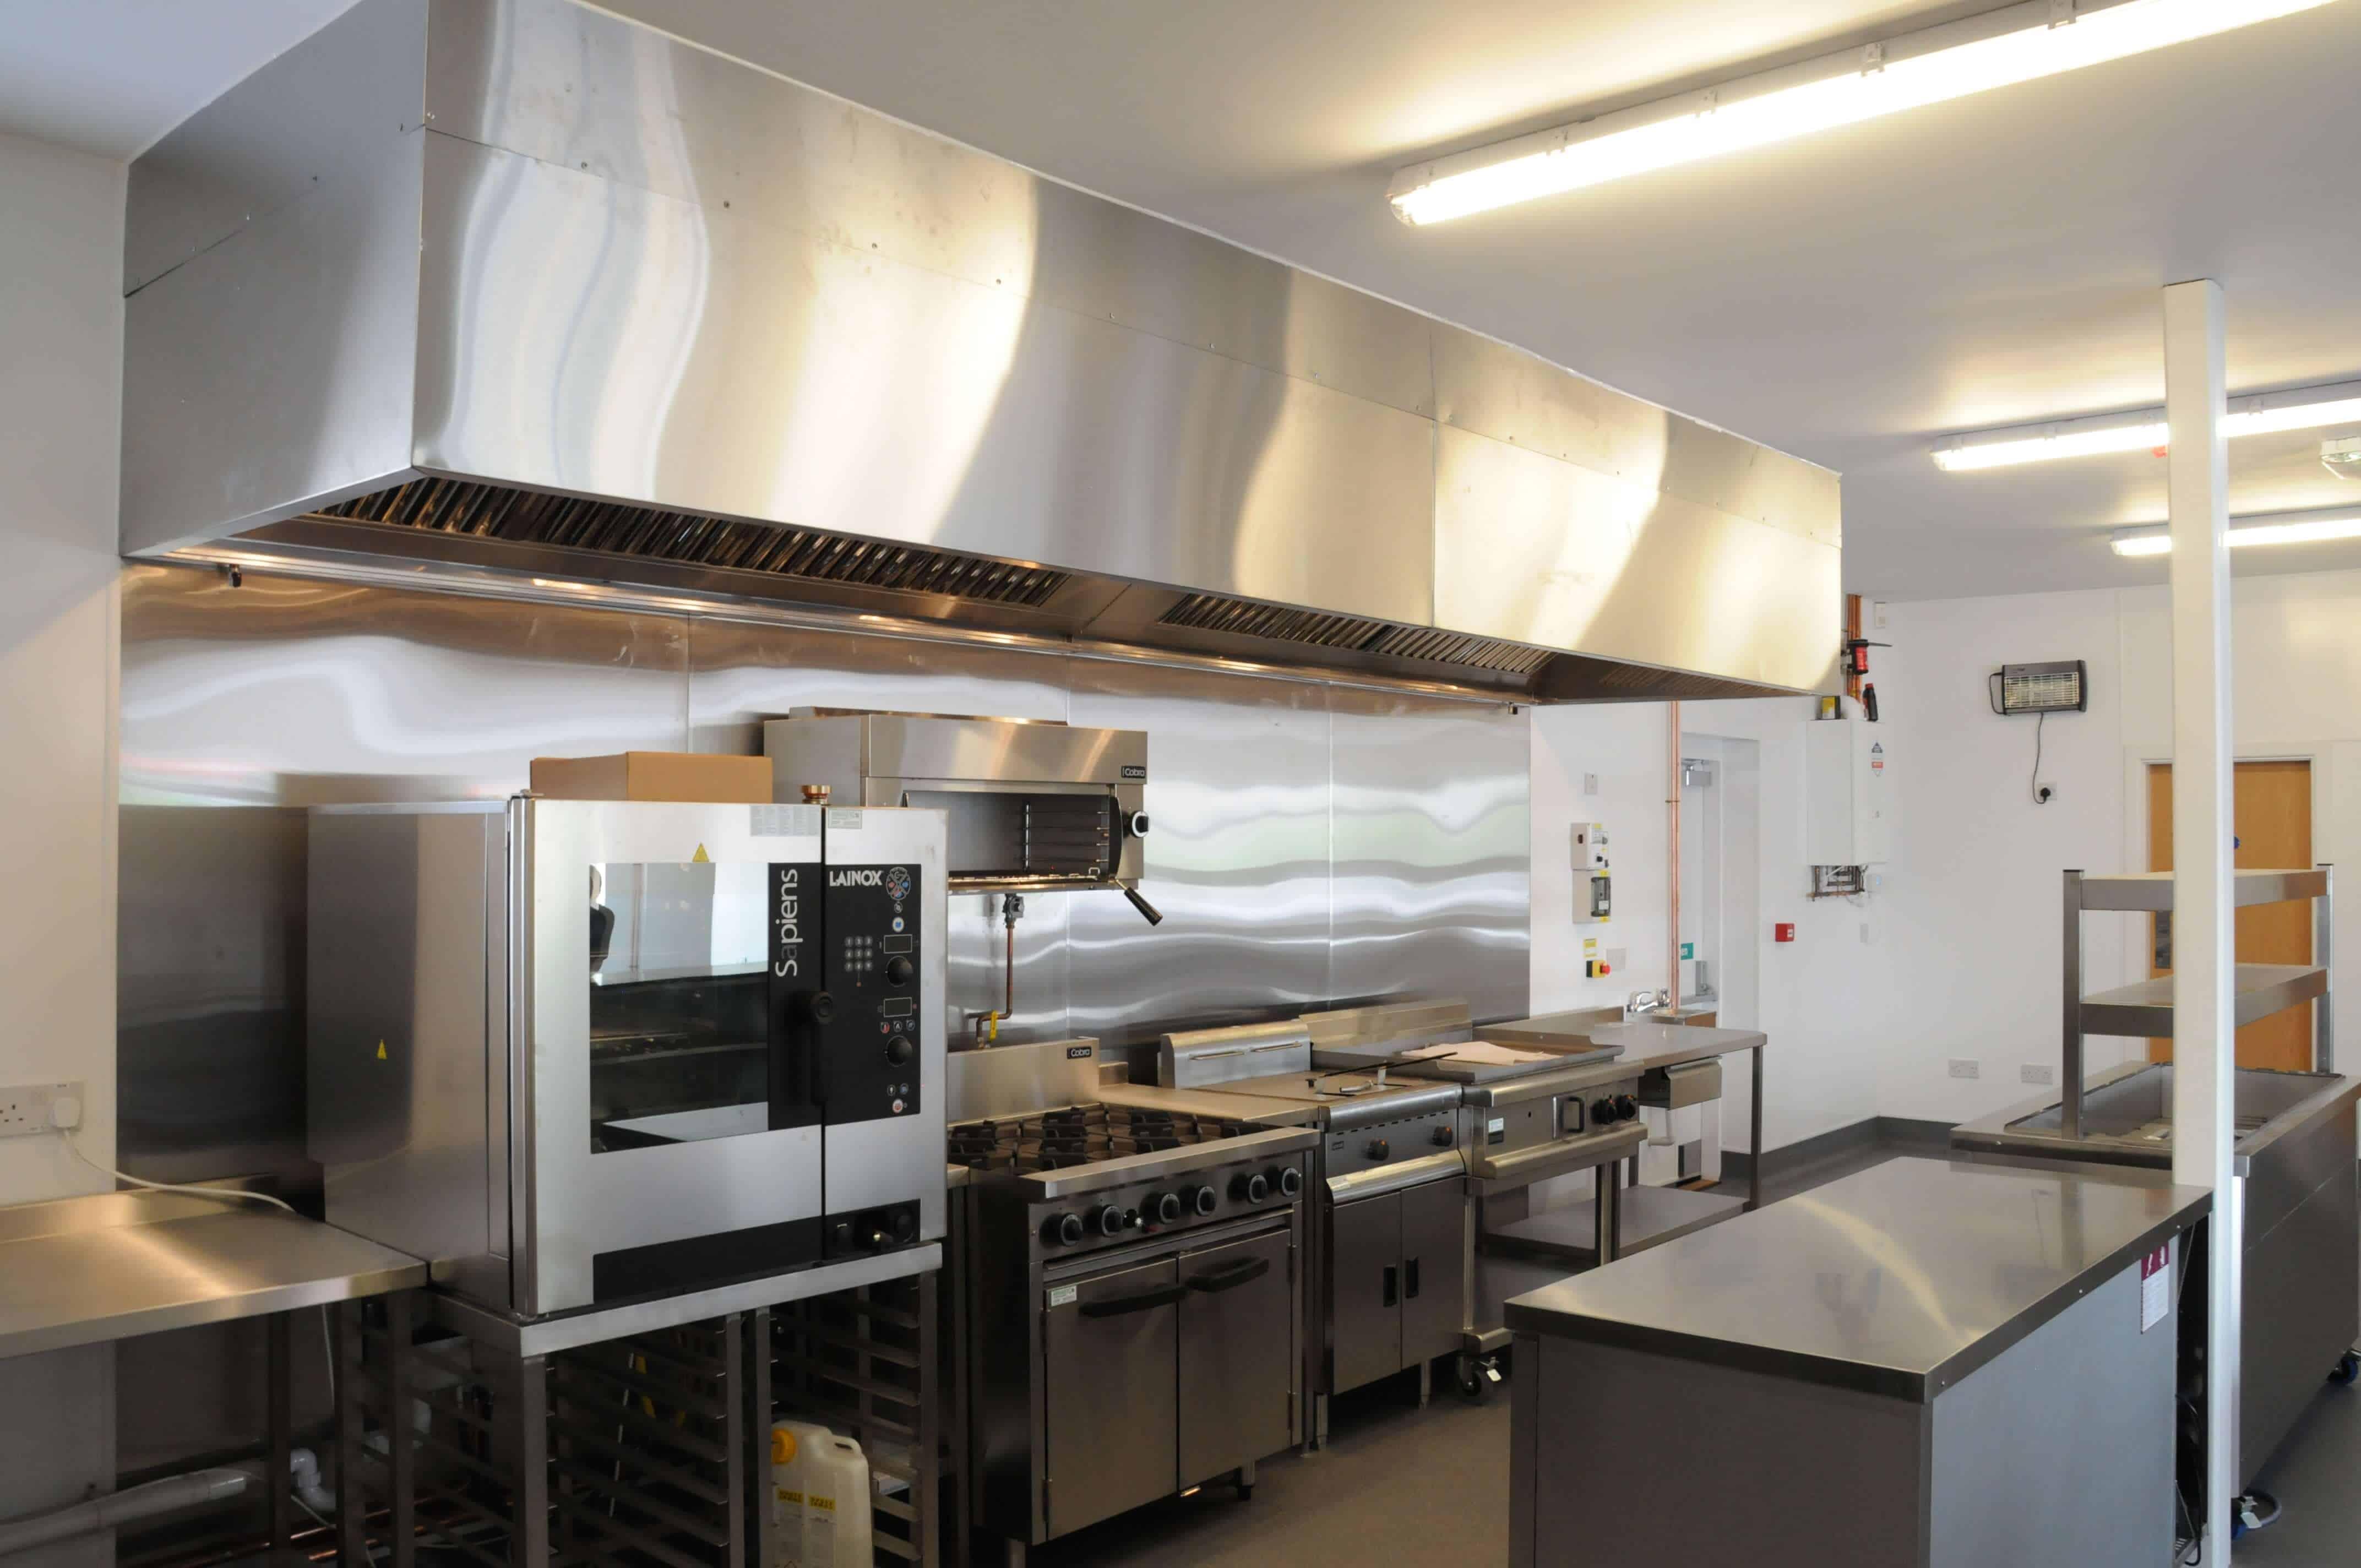 Commercial Kitchen Design West Midlands